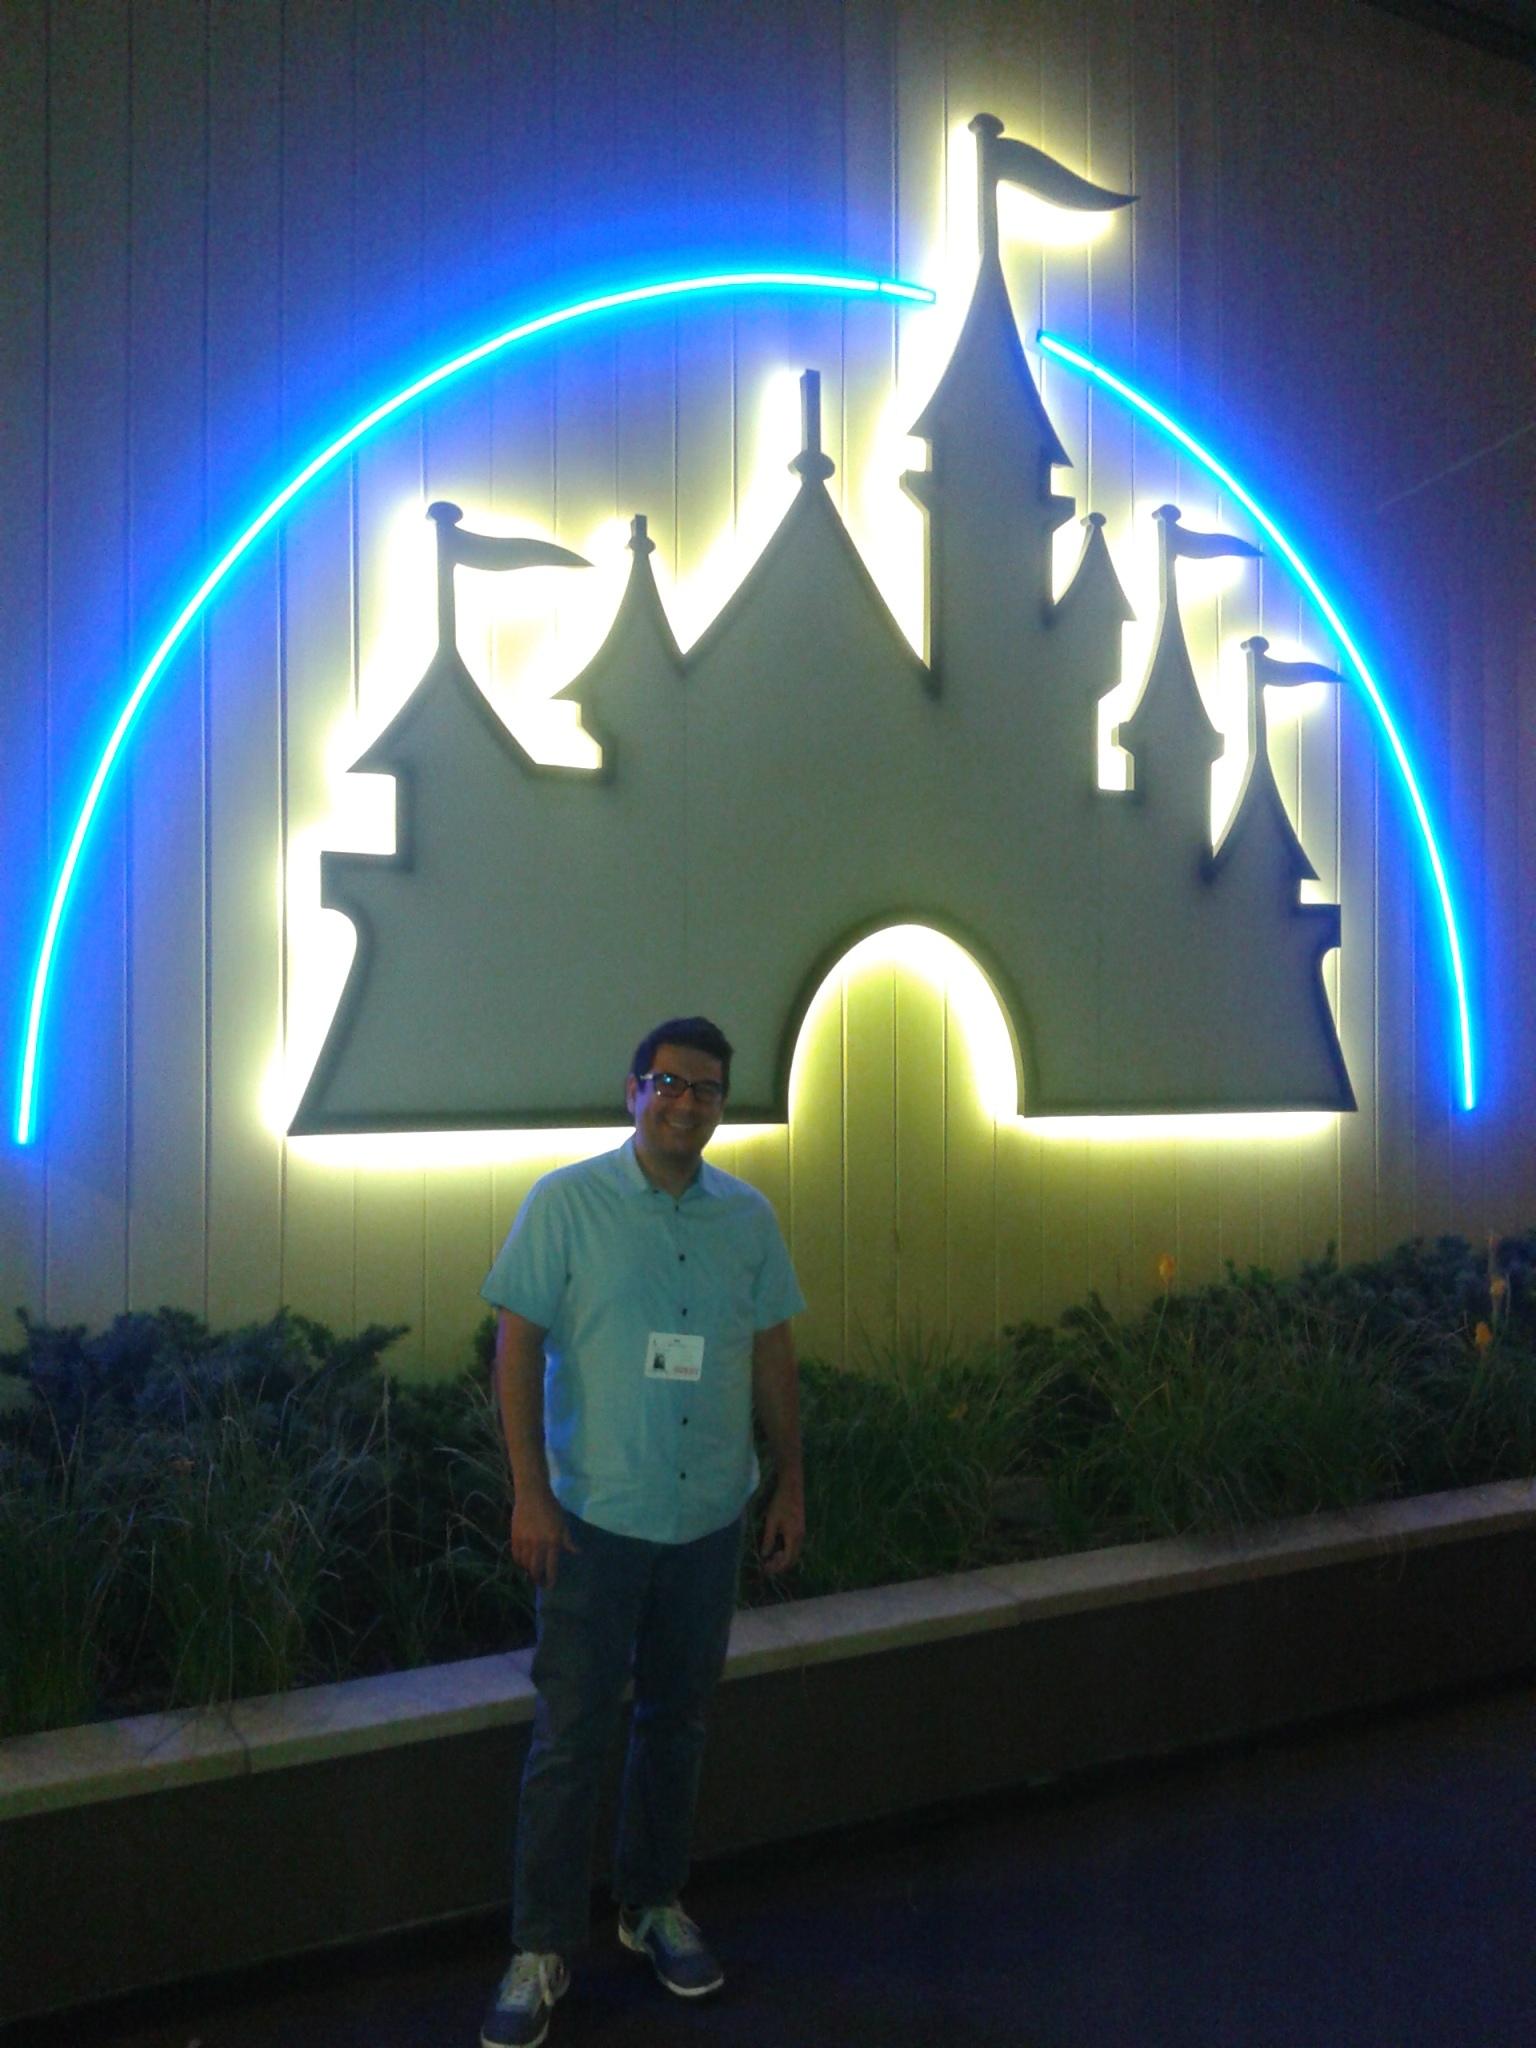 Disney Studios in Burbank